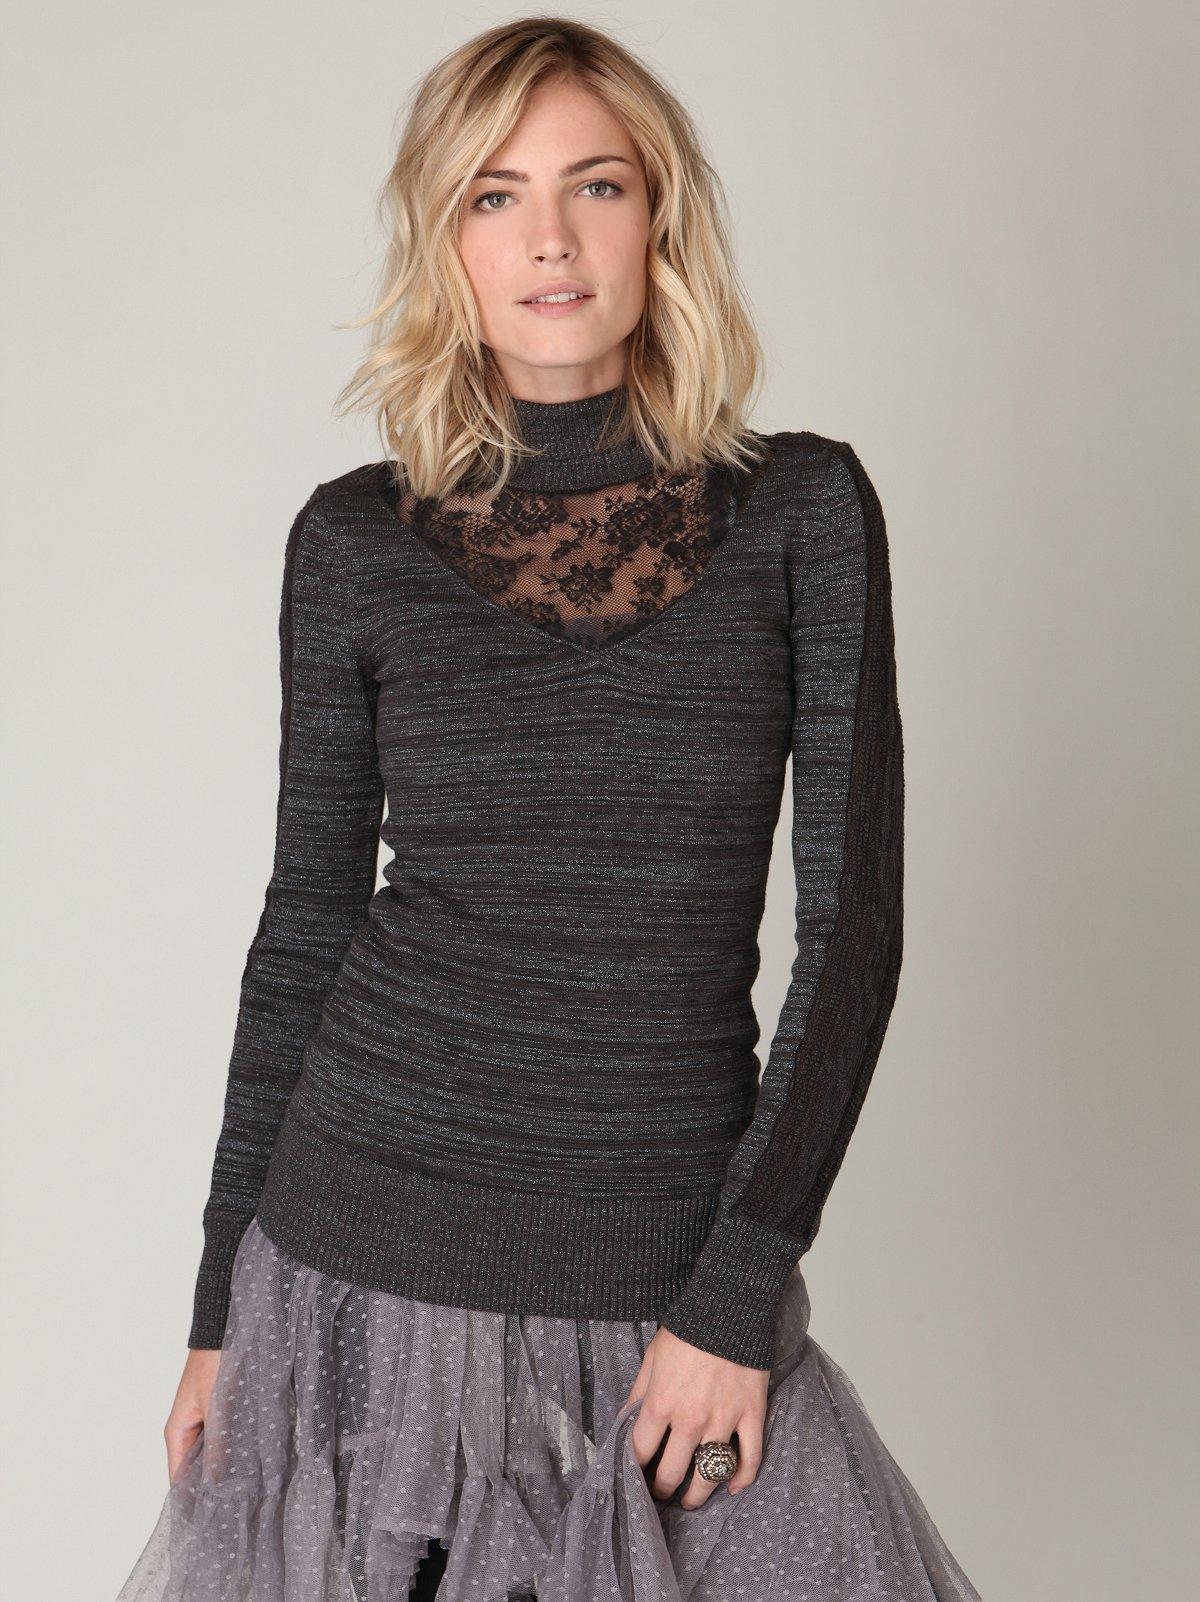 Long Sleeve Sweater & Lace Turtleneck